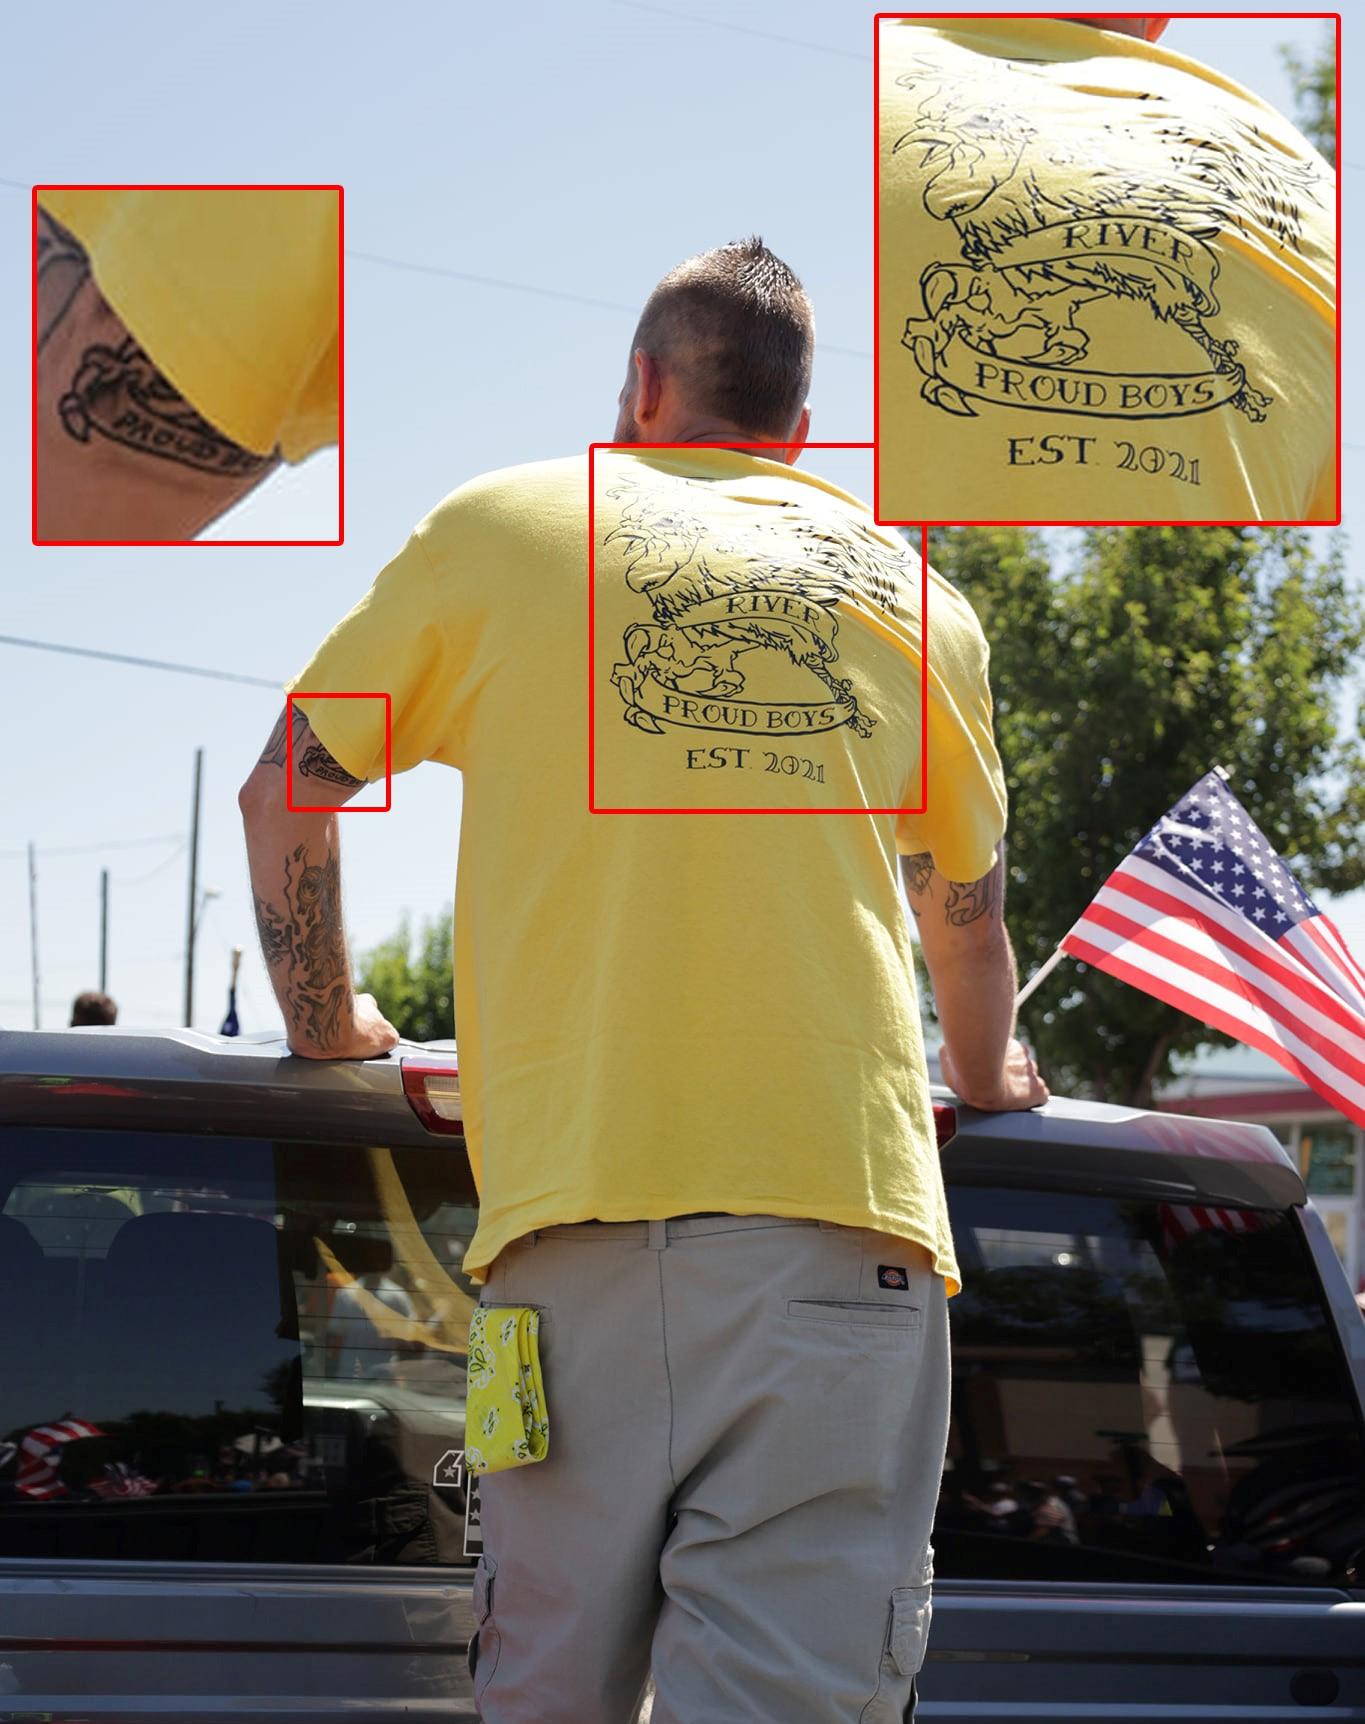 Jeffrey Keith Mustin wears a McKenzie River Proud Boy shirt